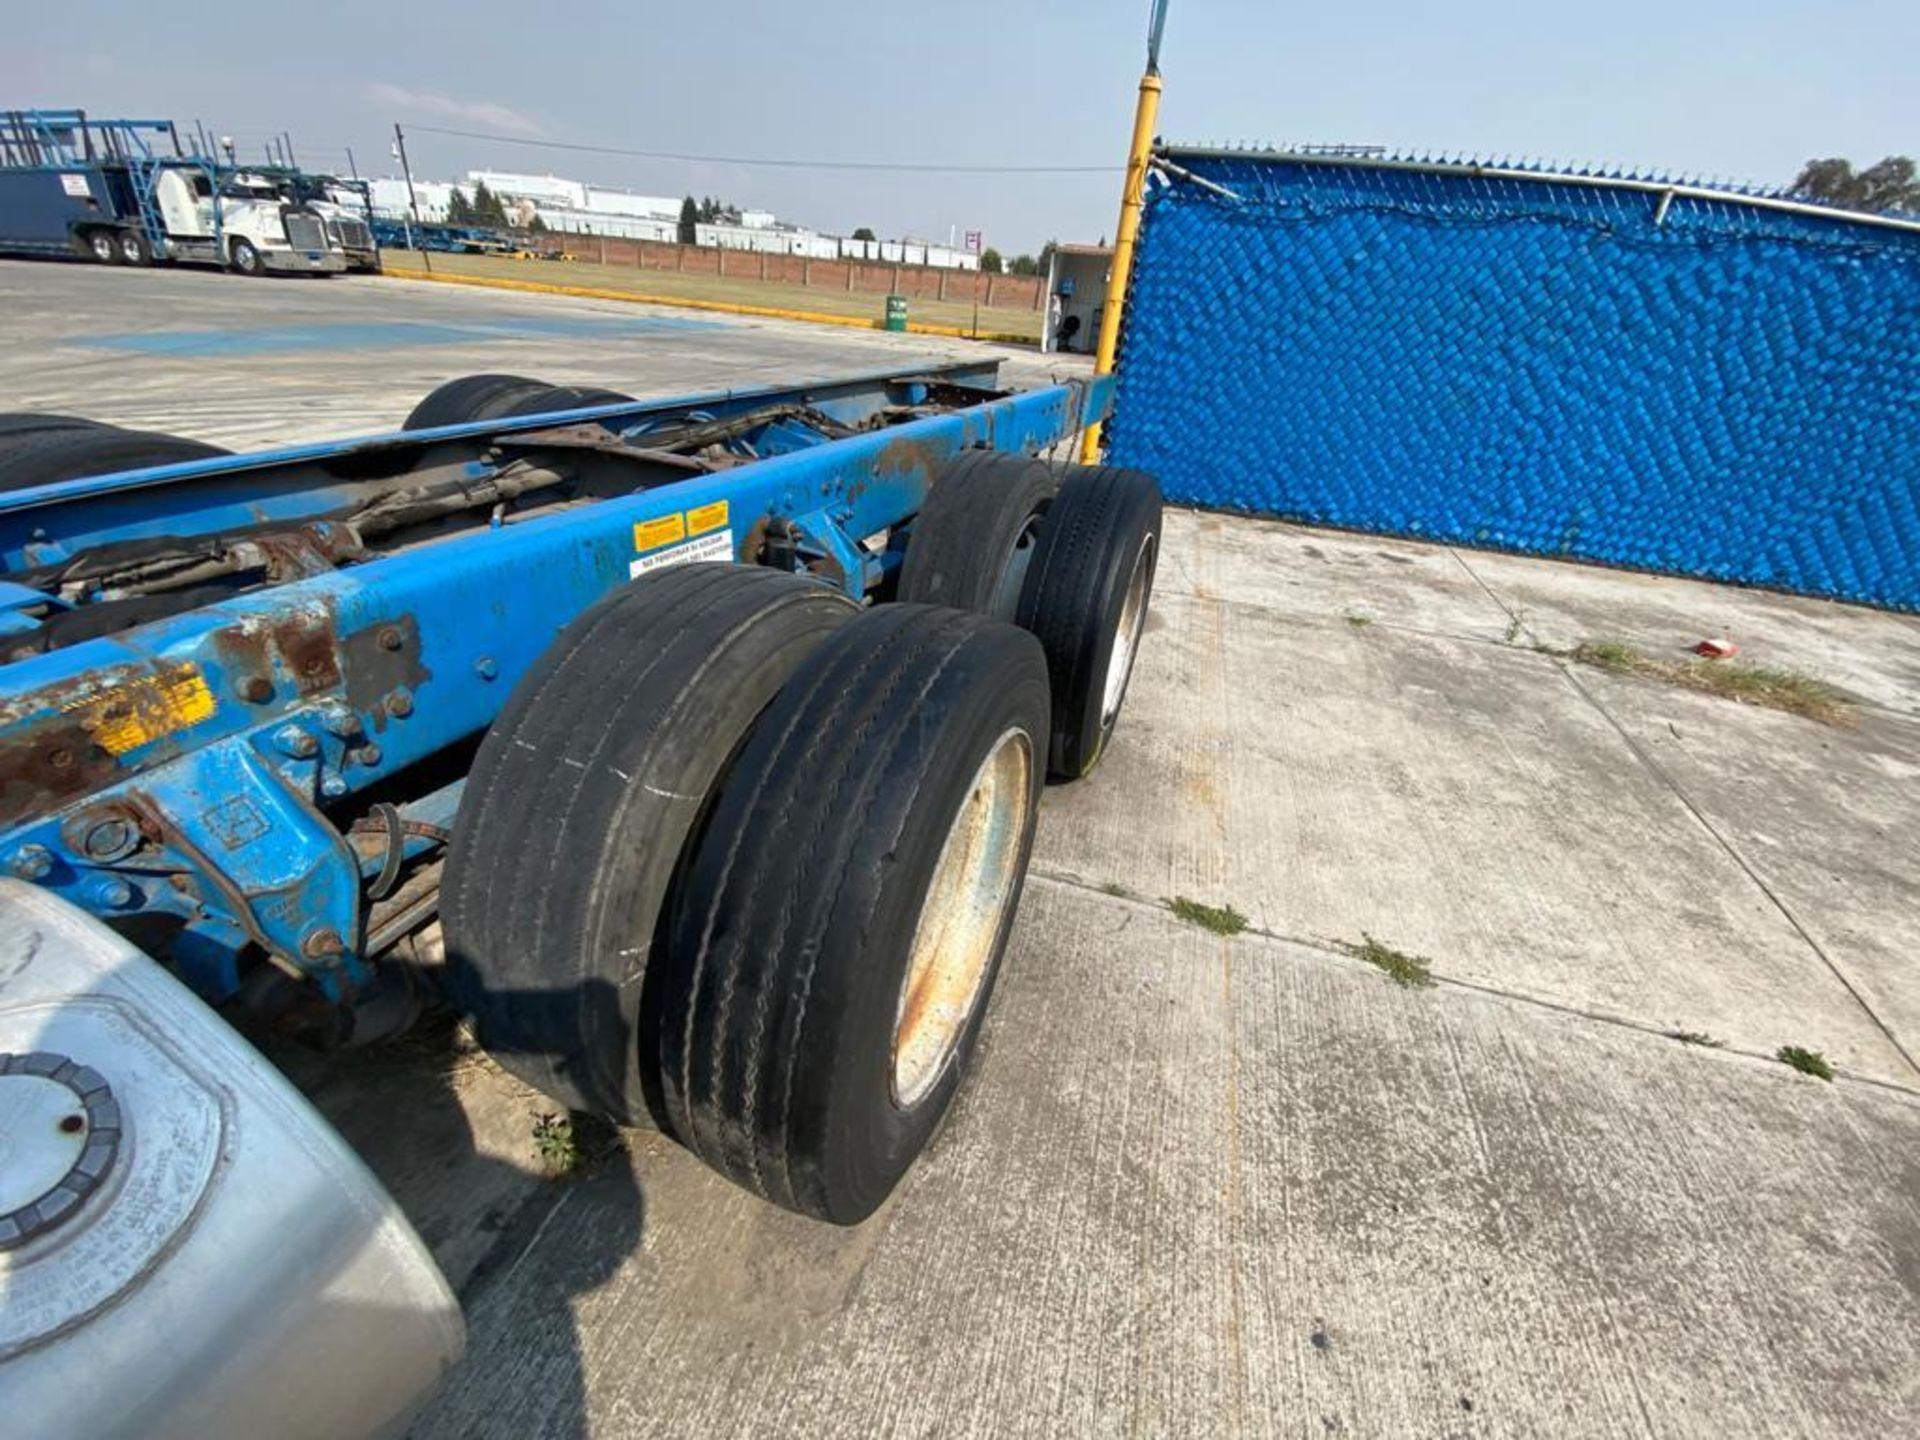 1999 Kenworth Sleeper truck tractor, standard transmission of 18 speeds - Image 17 of 75